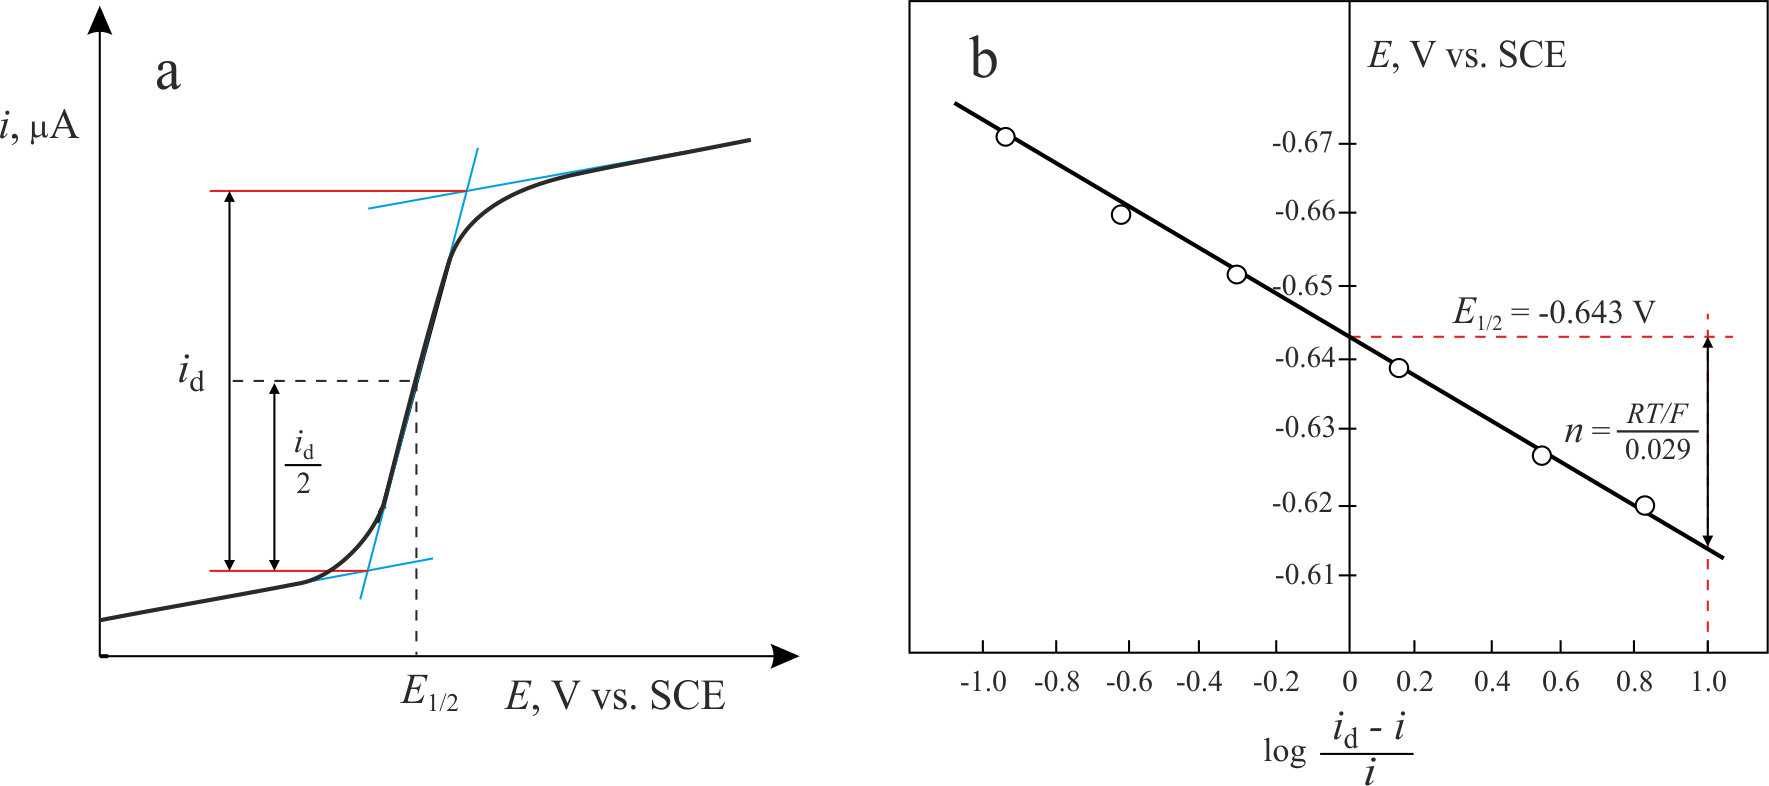 Heyrovsky-Ilkovic equation